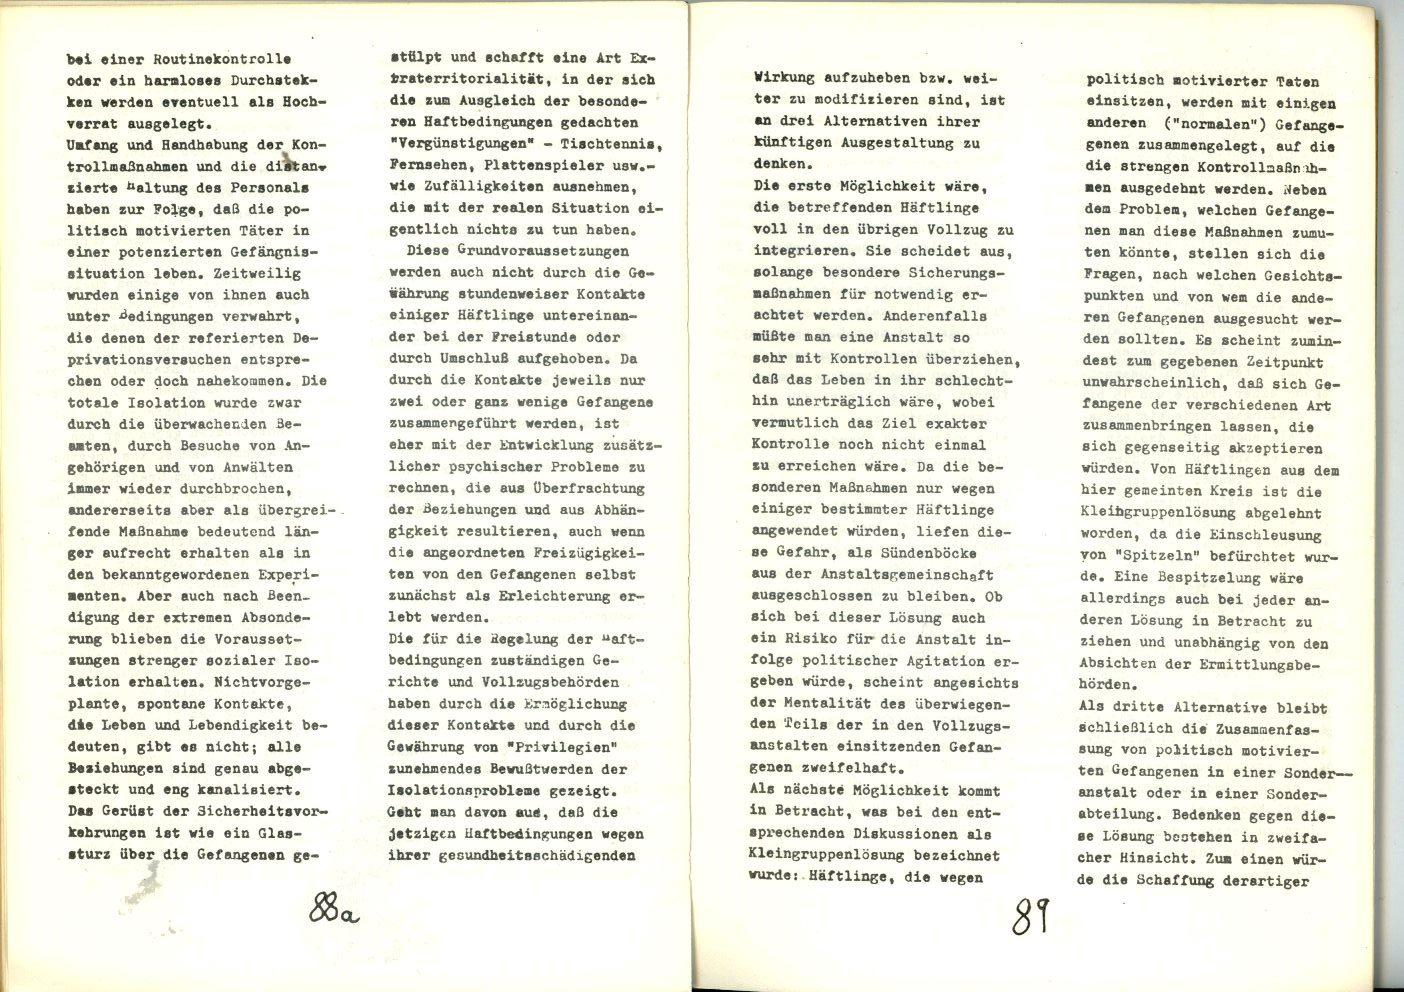 Marburg_Russell_Initiative_1978_46